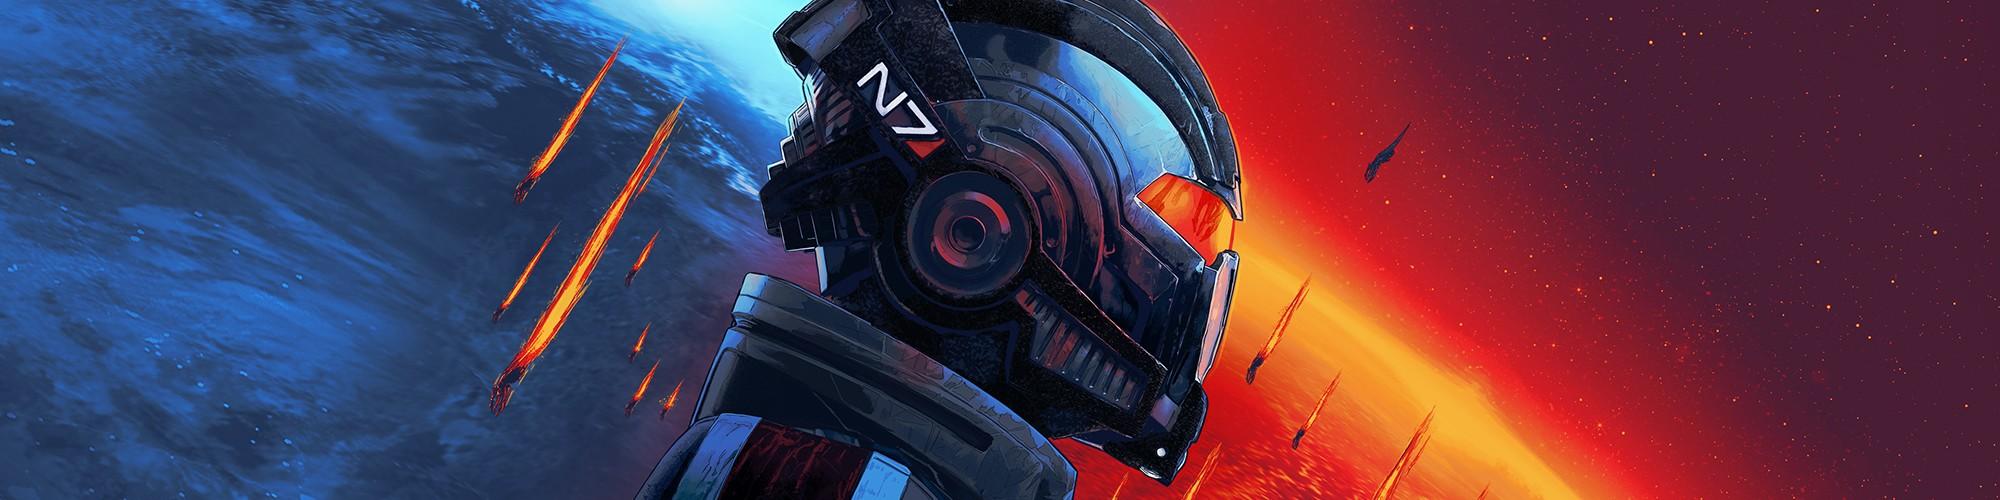 Best laptops for Mass Effect™ Legendary Edition